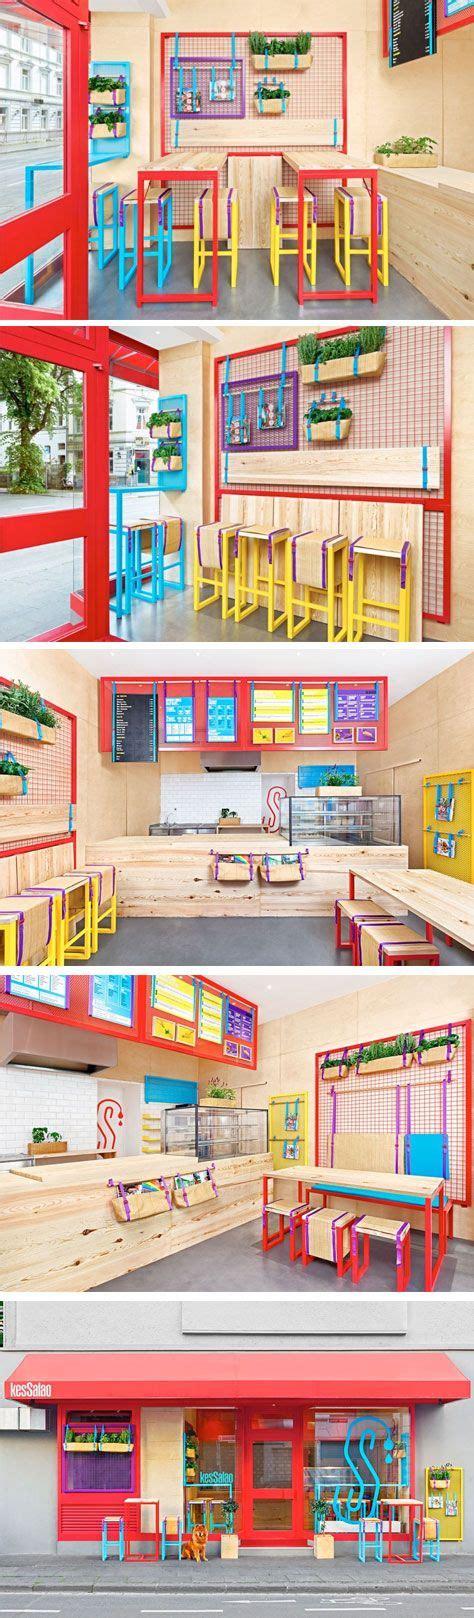 images chips fast food pinterest